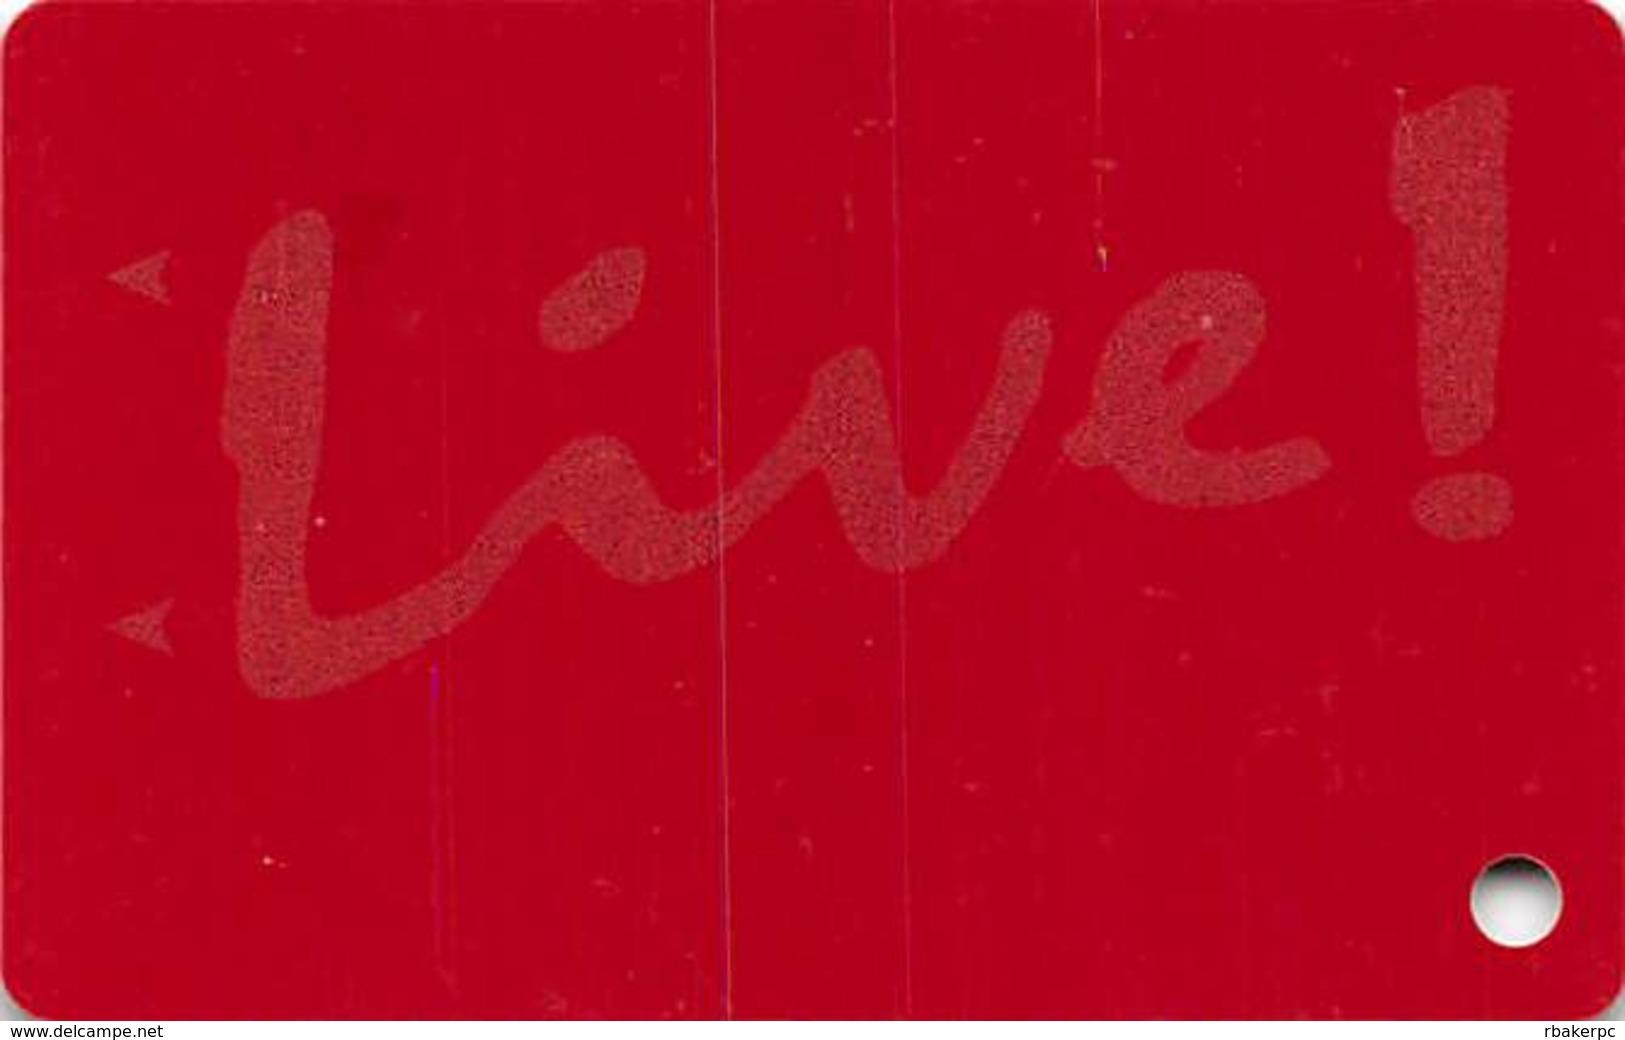 Maryland Live Casino - Hanover, MD - Slot Card - Casino Cards